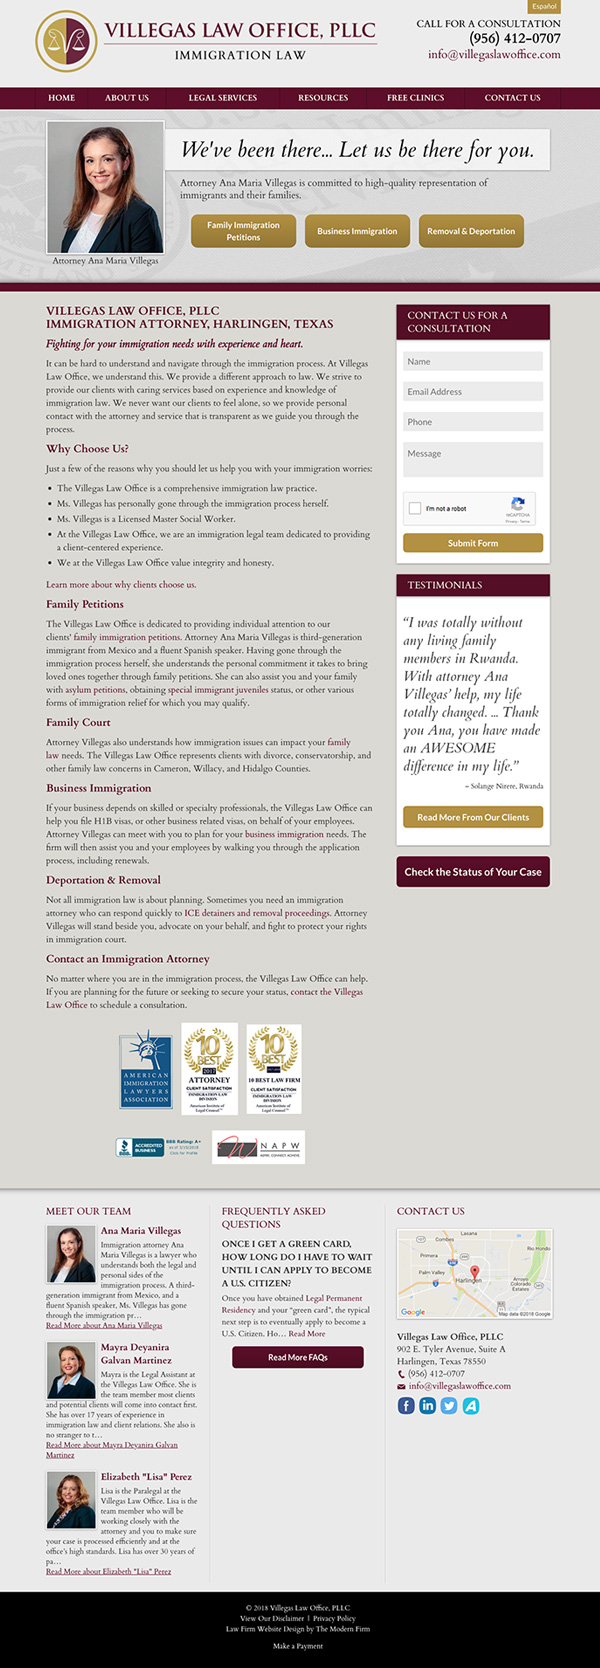 Law Firm Website Design for Villegas Law Office, PLLC